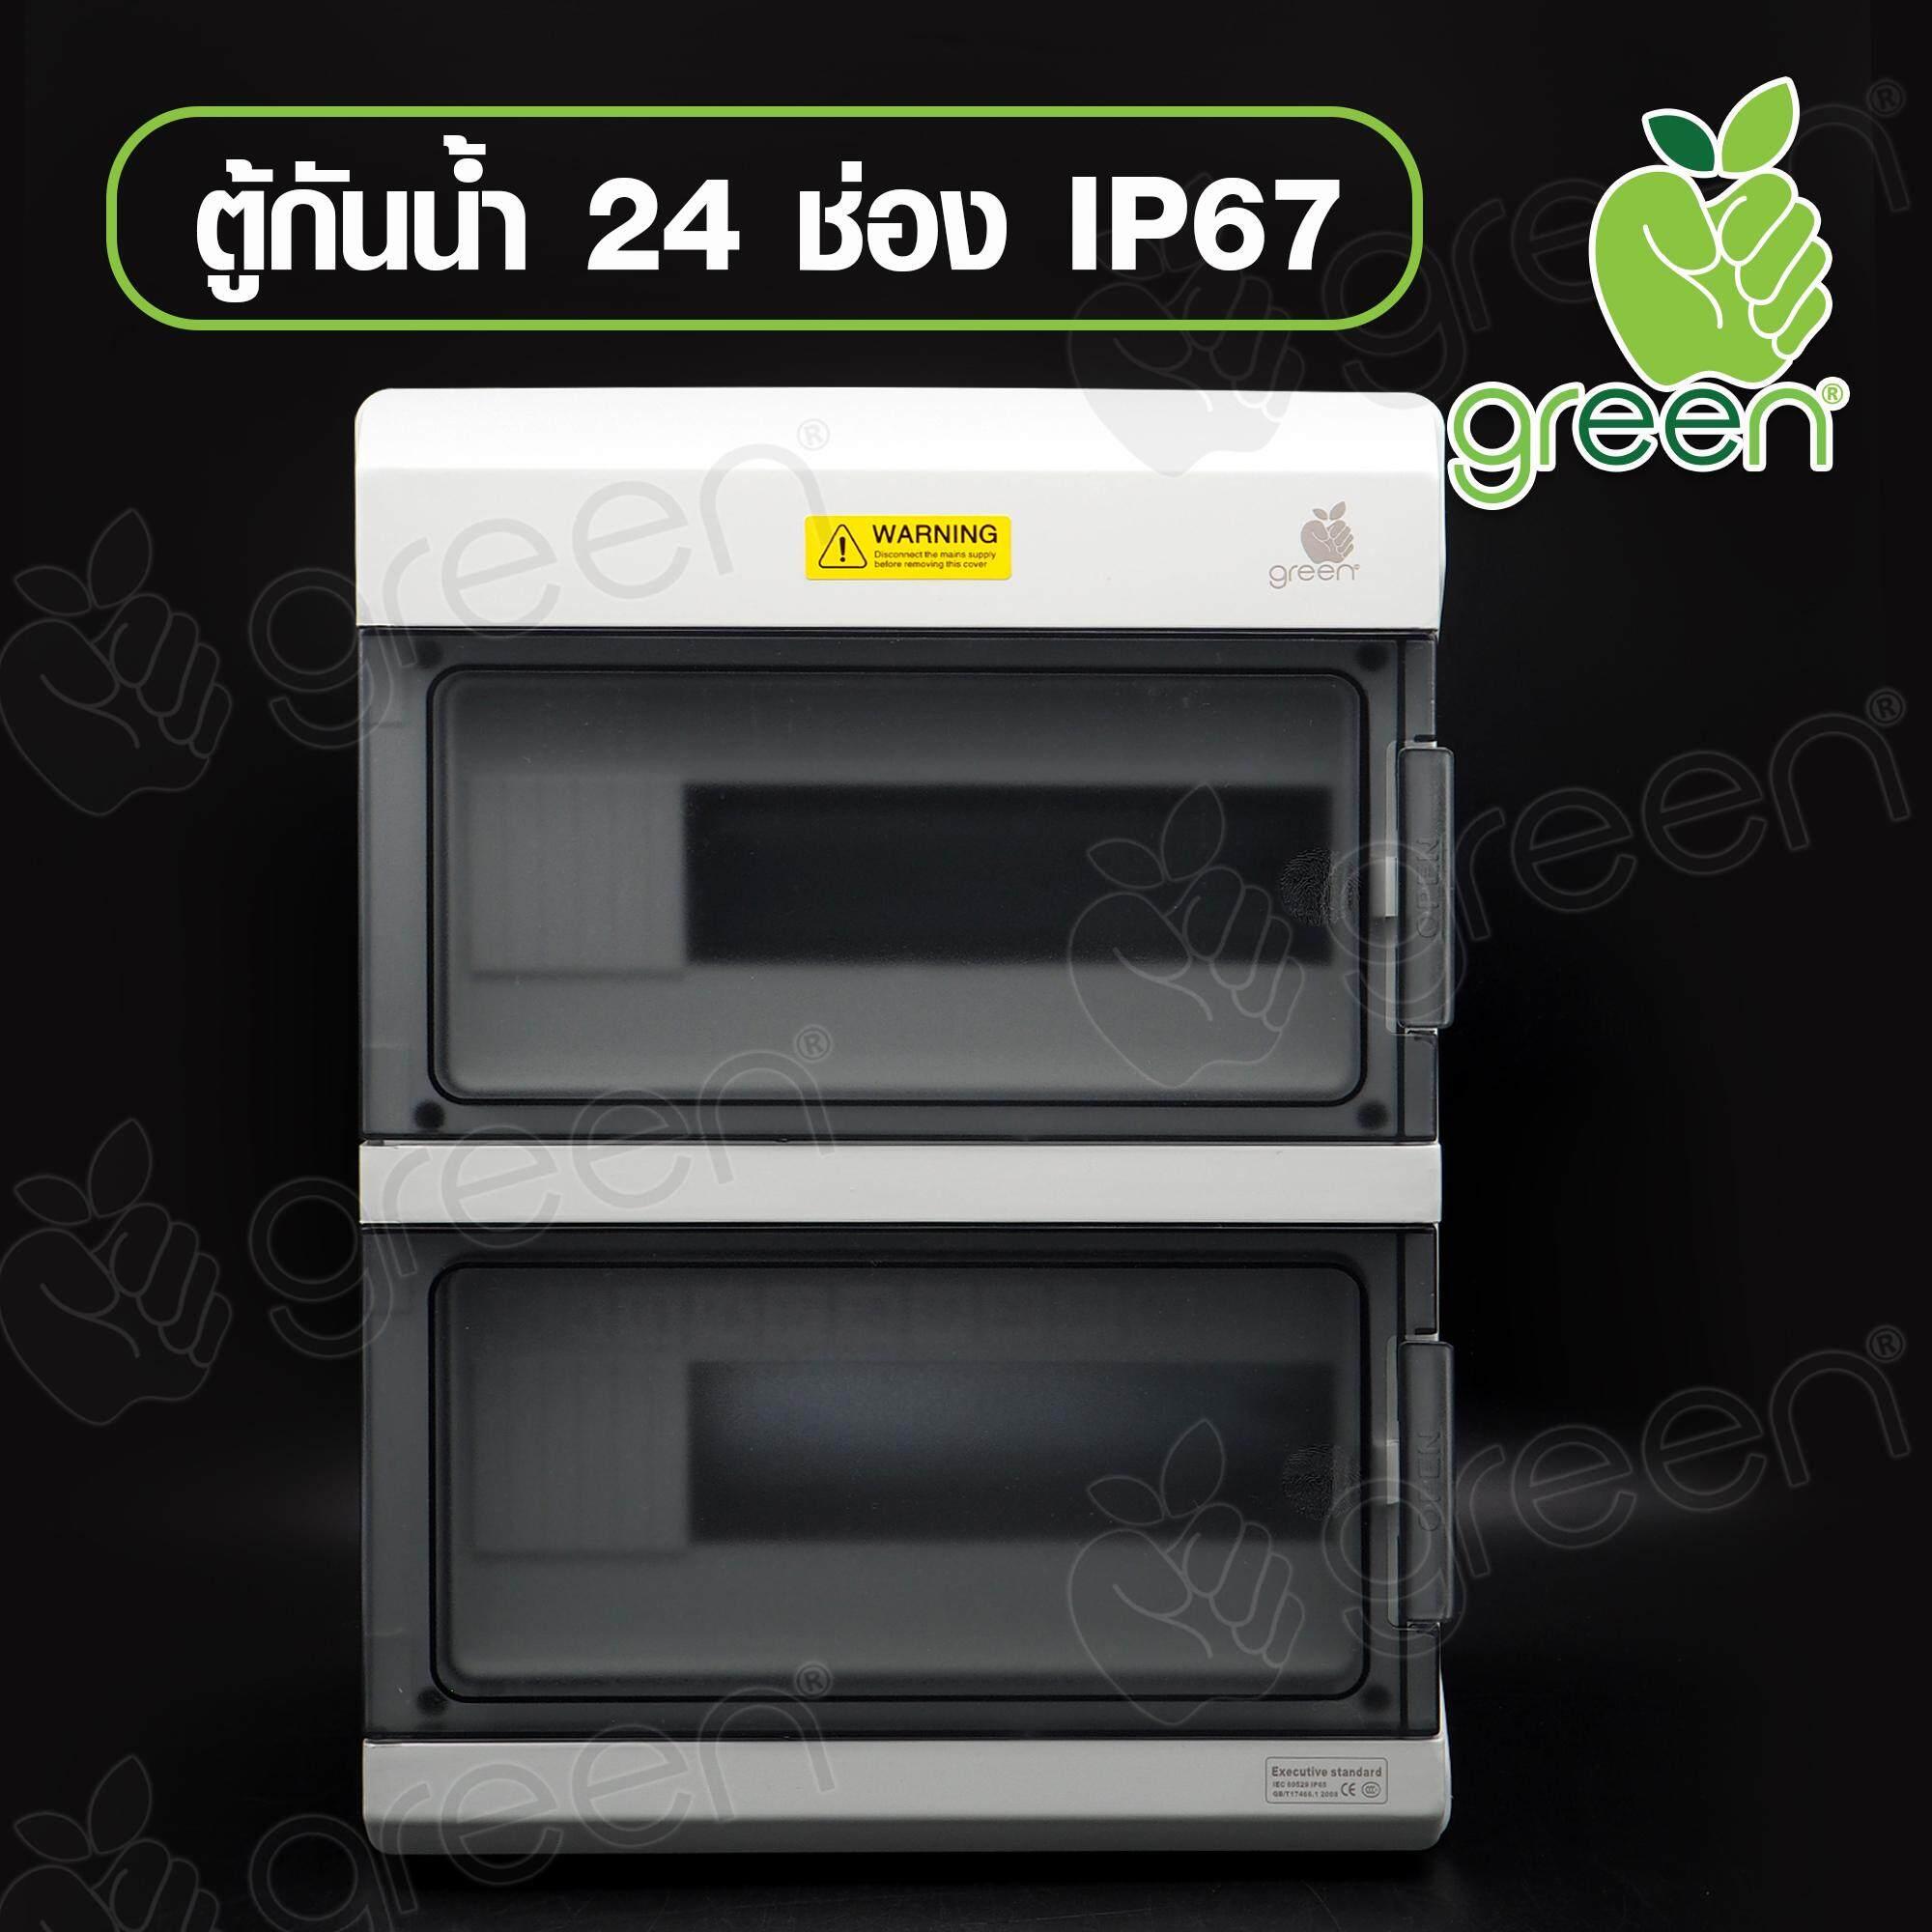 Applegreen Consumer Unit Combiner Box 24 ช่อง Ip67 Dc 12v 24v 48v Ac Breaker 220v ตู้โหลดกันน้ำ ตู้เปล่า ใช้ได้ทั้งภายในและภายนอกอาคาร  ใช้กับไฟบ้าน ใช้กับโซล่าเซลล์.